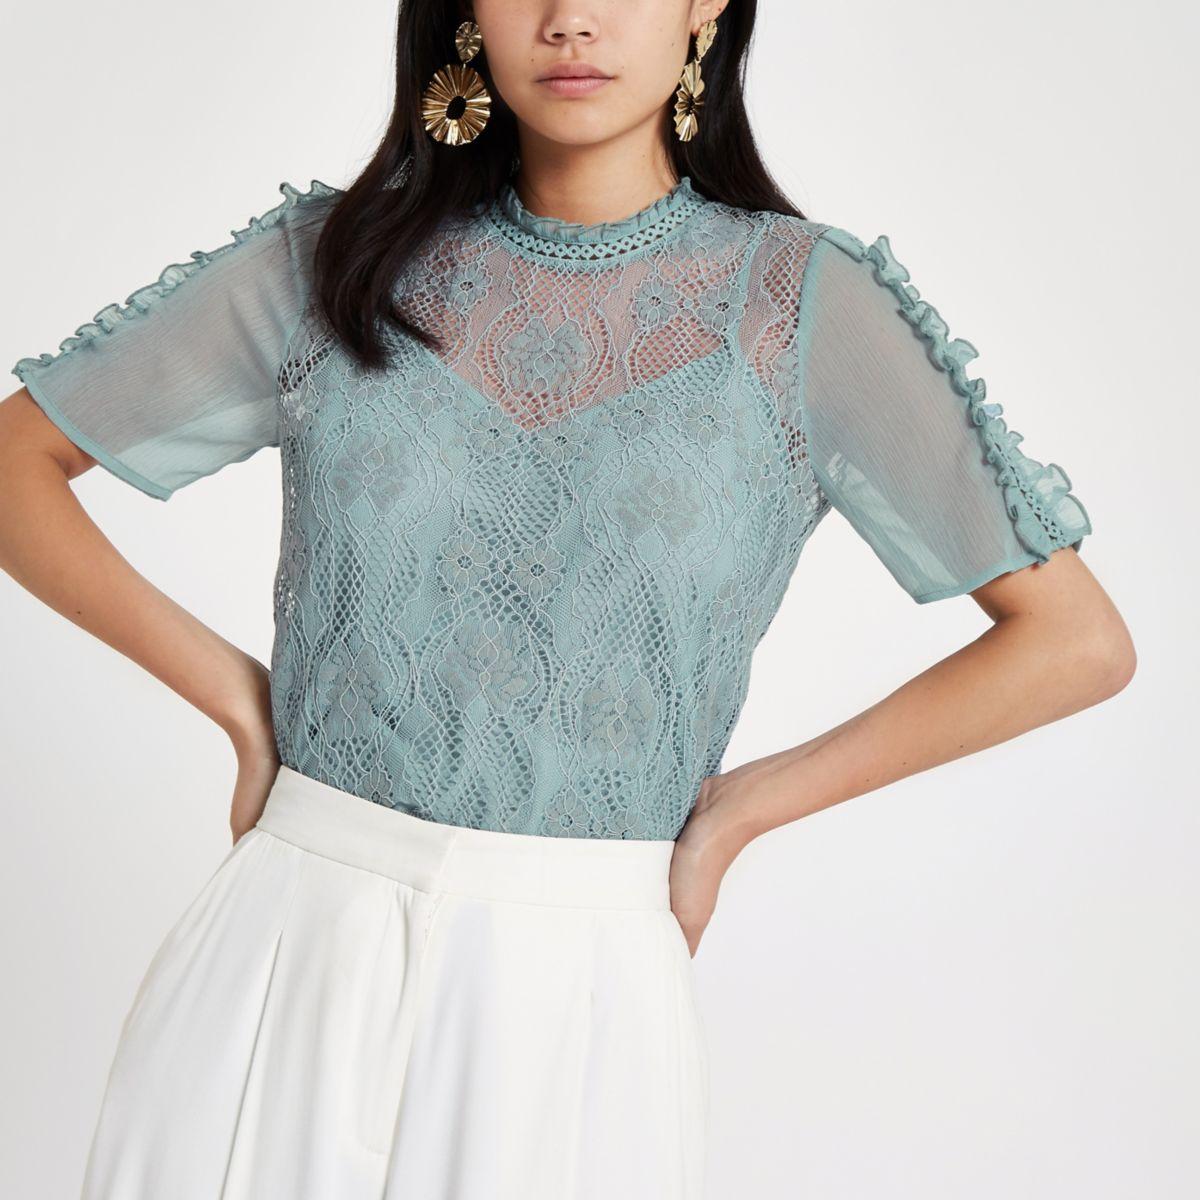 Light blue lace short sleeve top